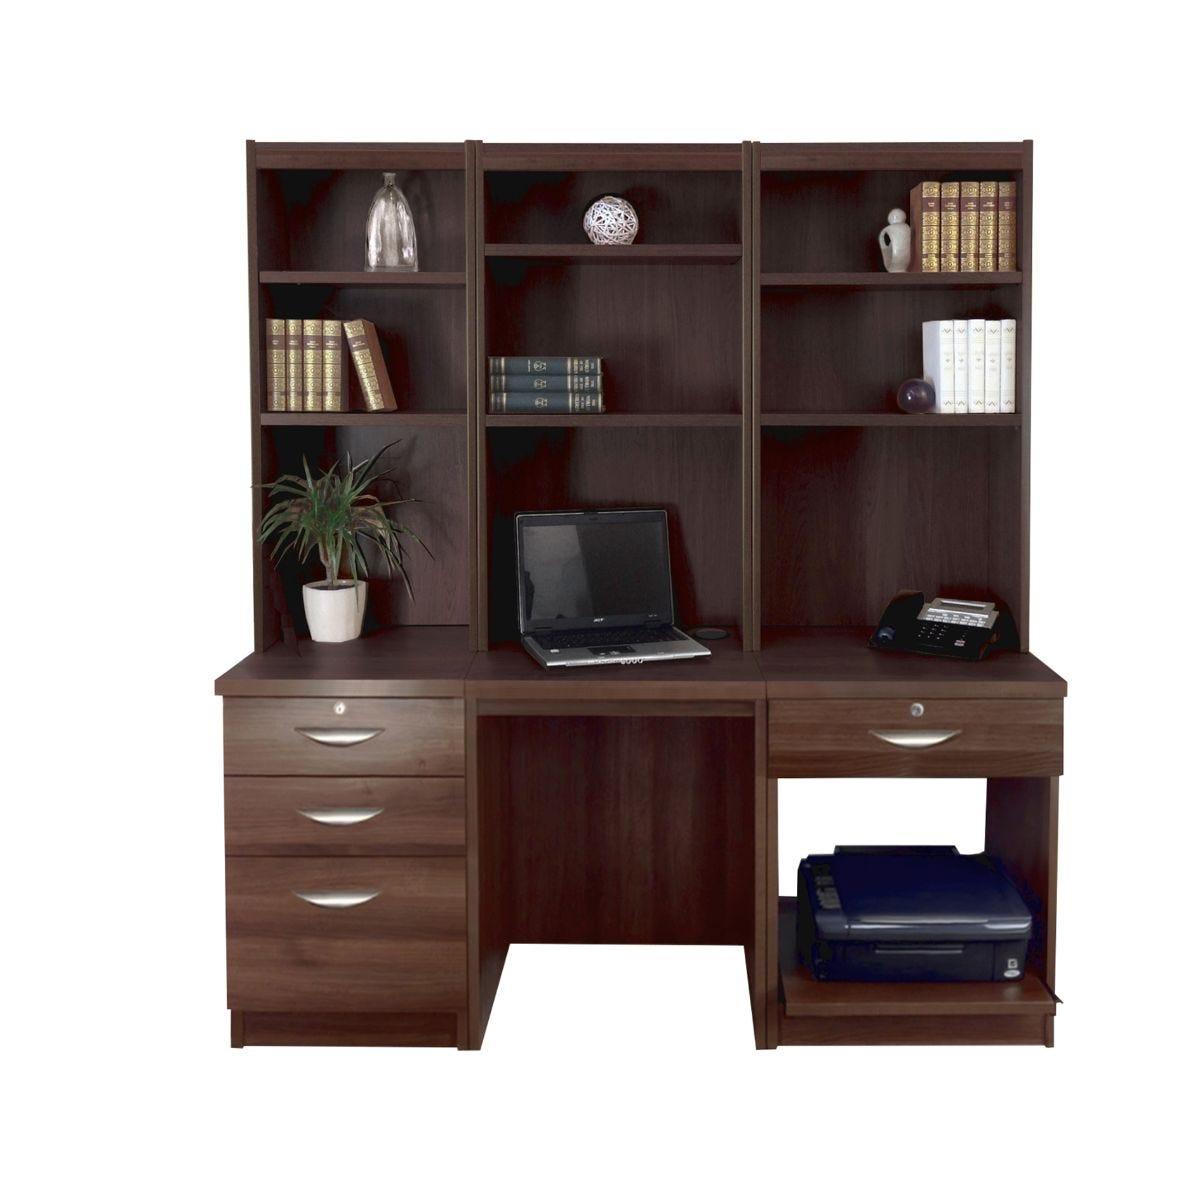 R White Home Office Desk Workstation, Walnut